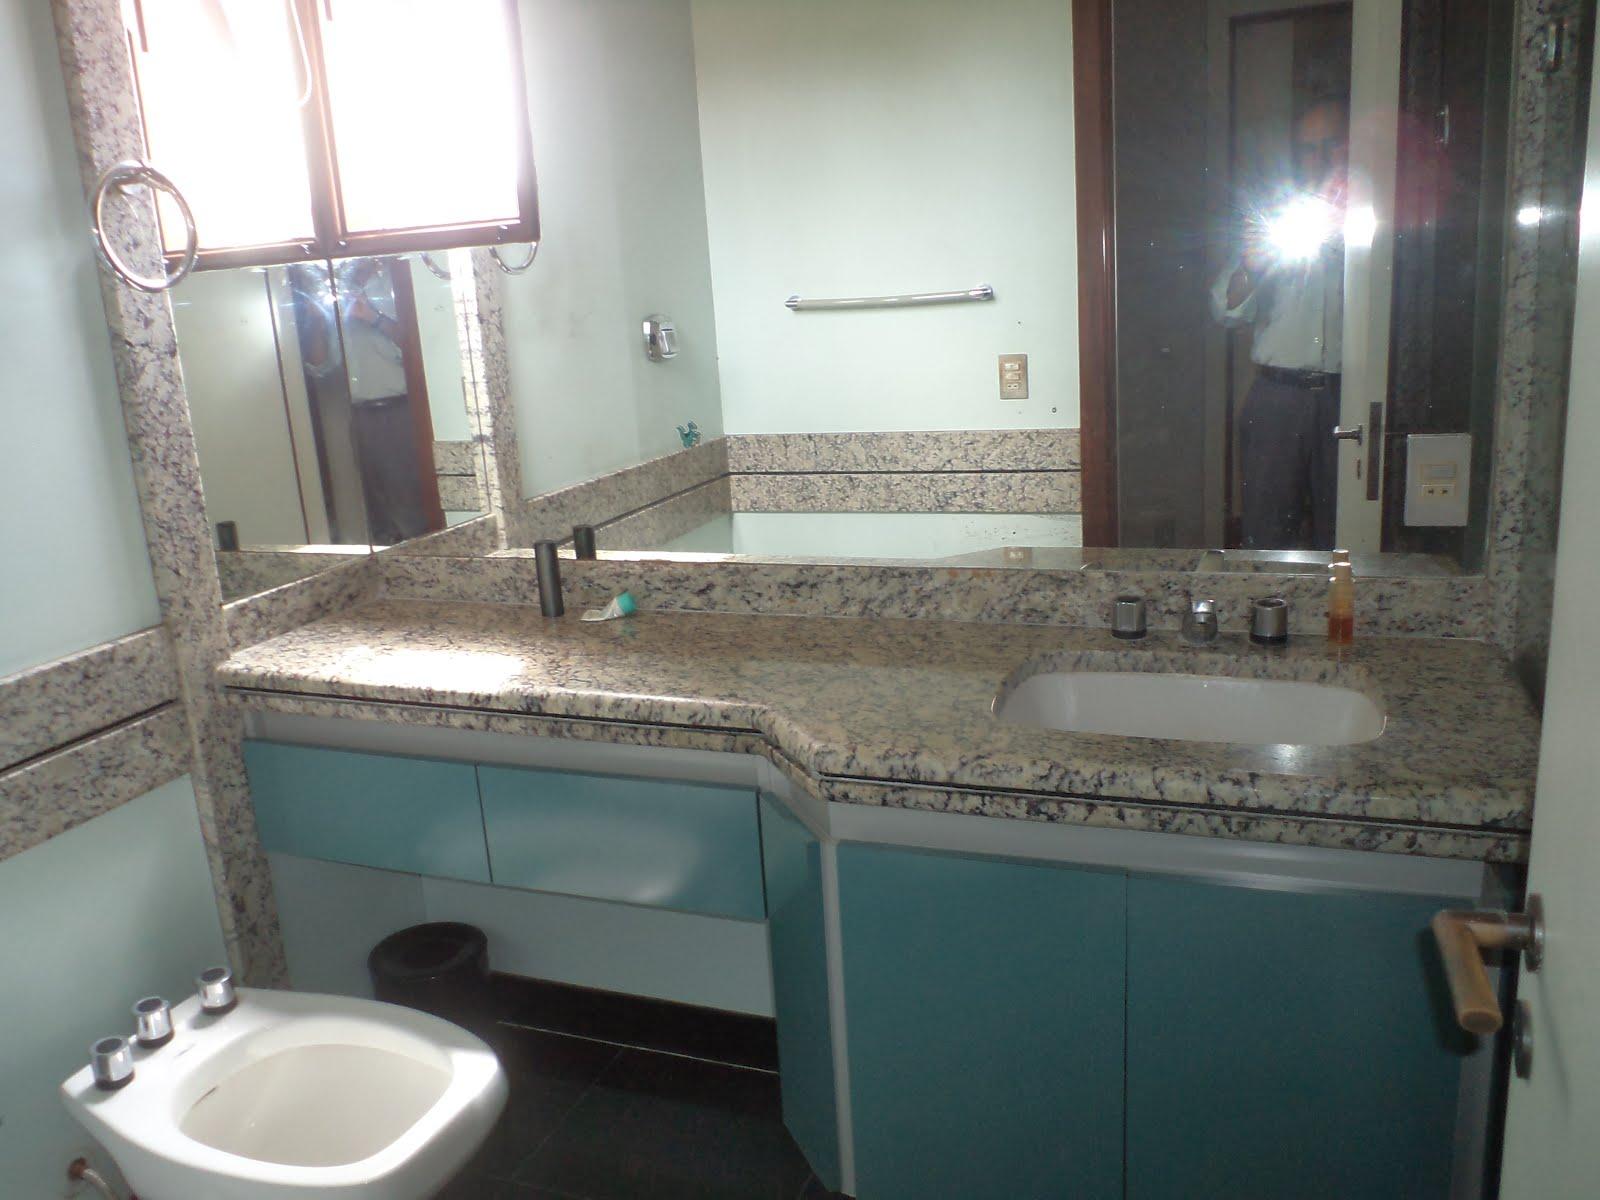 Bancada Banheiro Bar Churrasqueira Cozinha Cubas Escada Frisos Picture #495F60 1600x1200 Banheiro Bancada